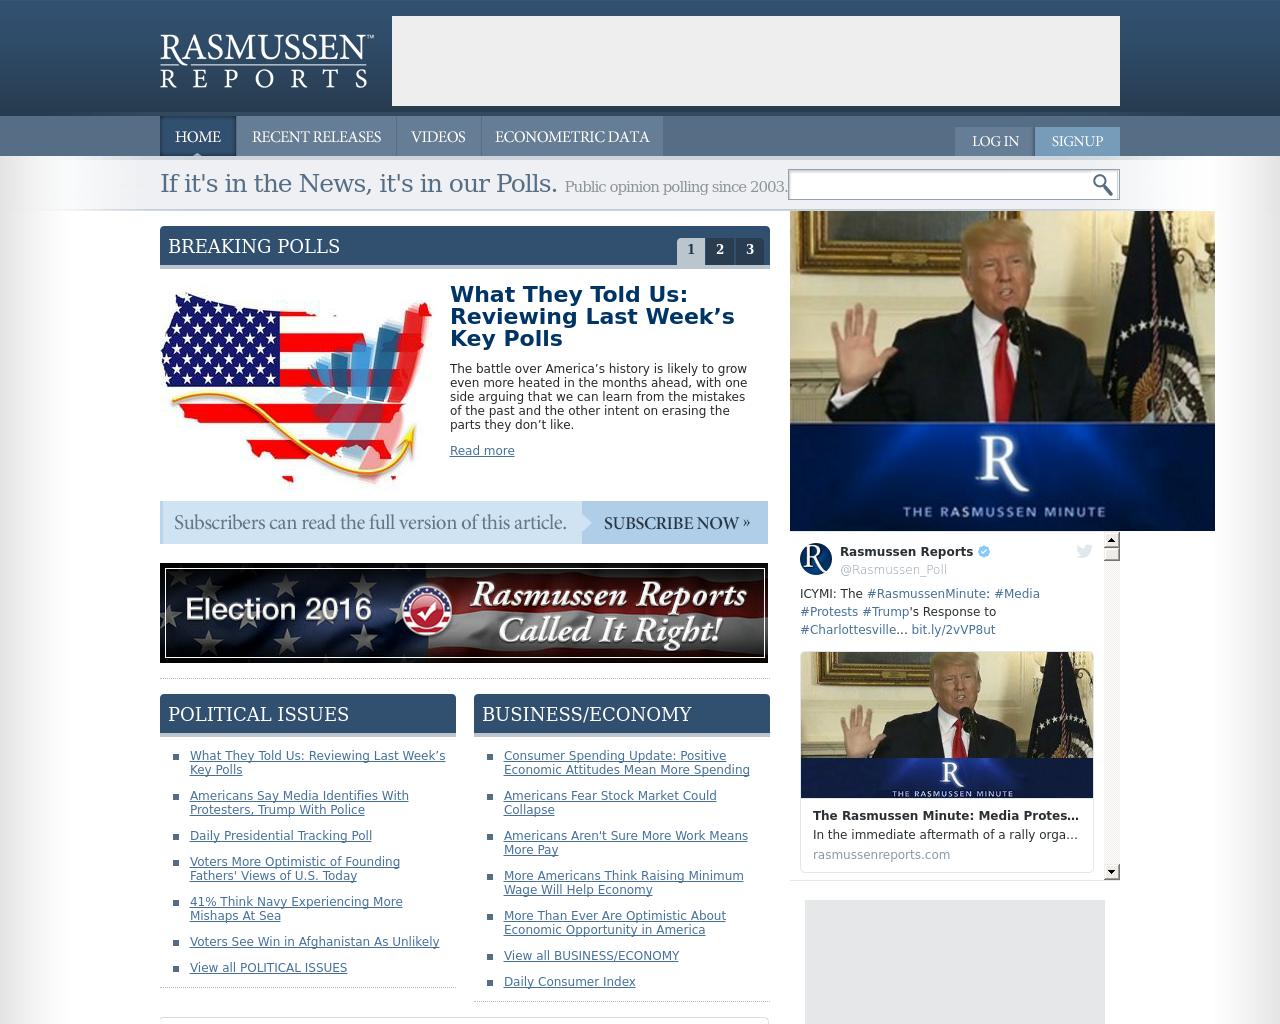 Rasmussen-Reports-Advertising-Reviews-Pricing